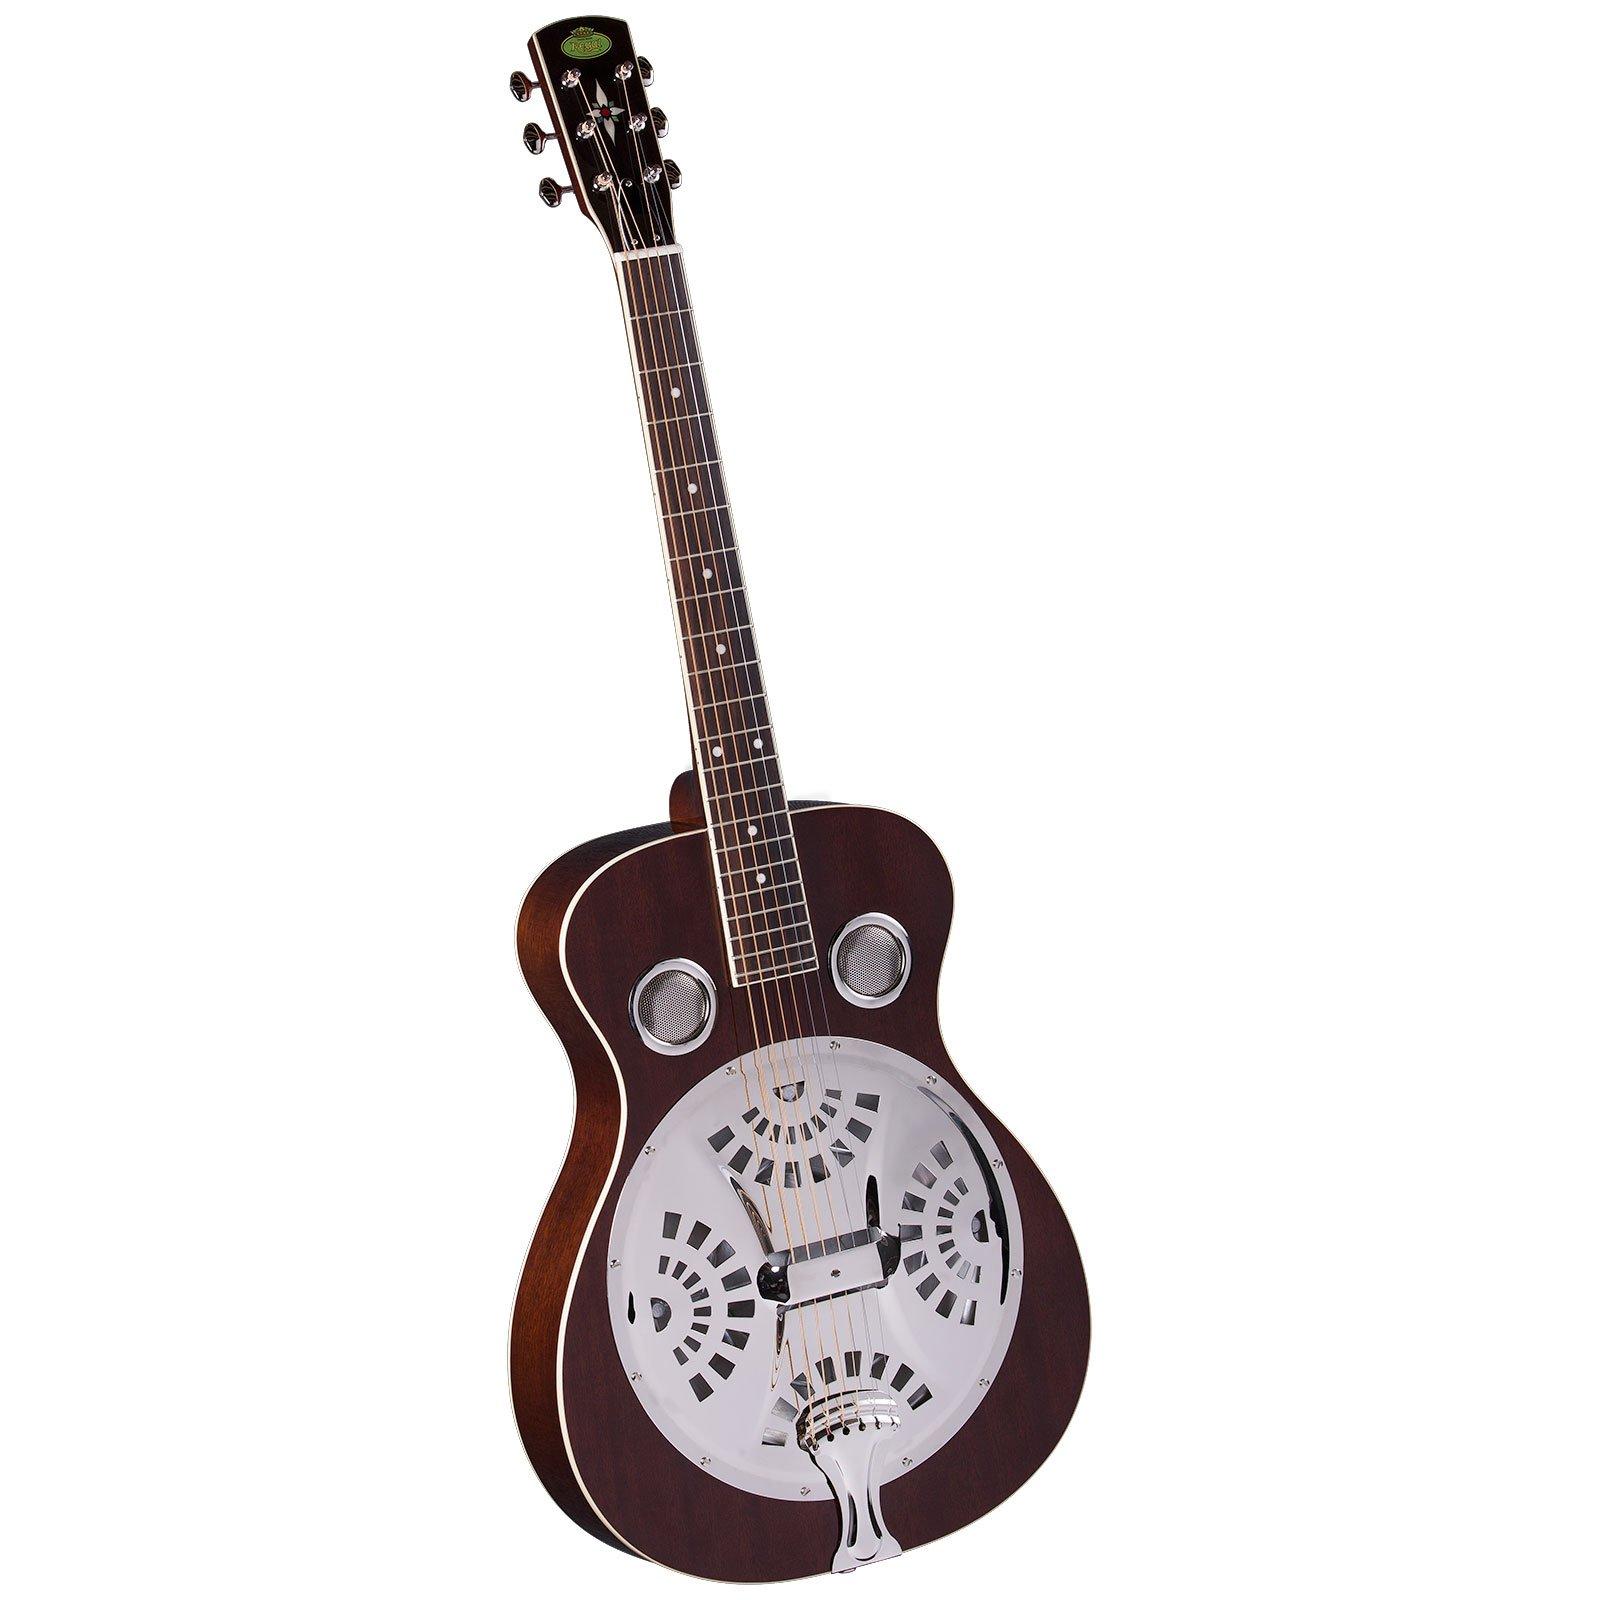 Regal RD-40M Studio Series Roundneck Resophonic Guitar - Natural Mahogany by Regal Resophonic Guitars